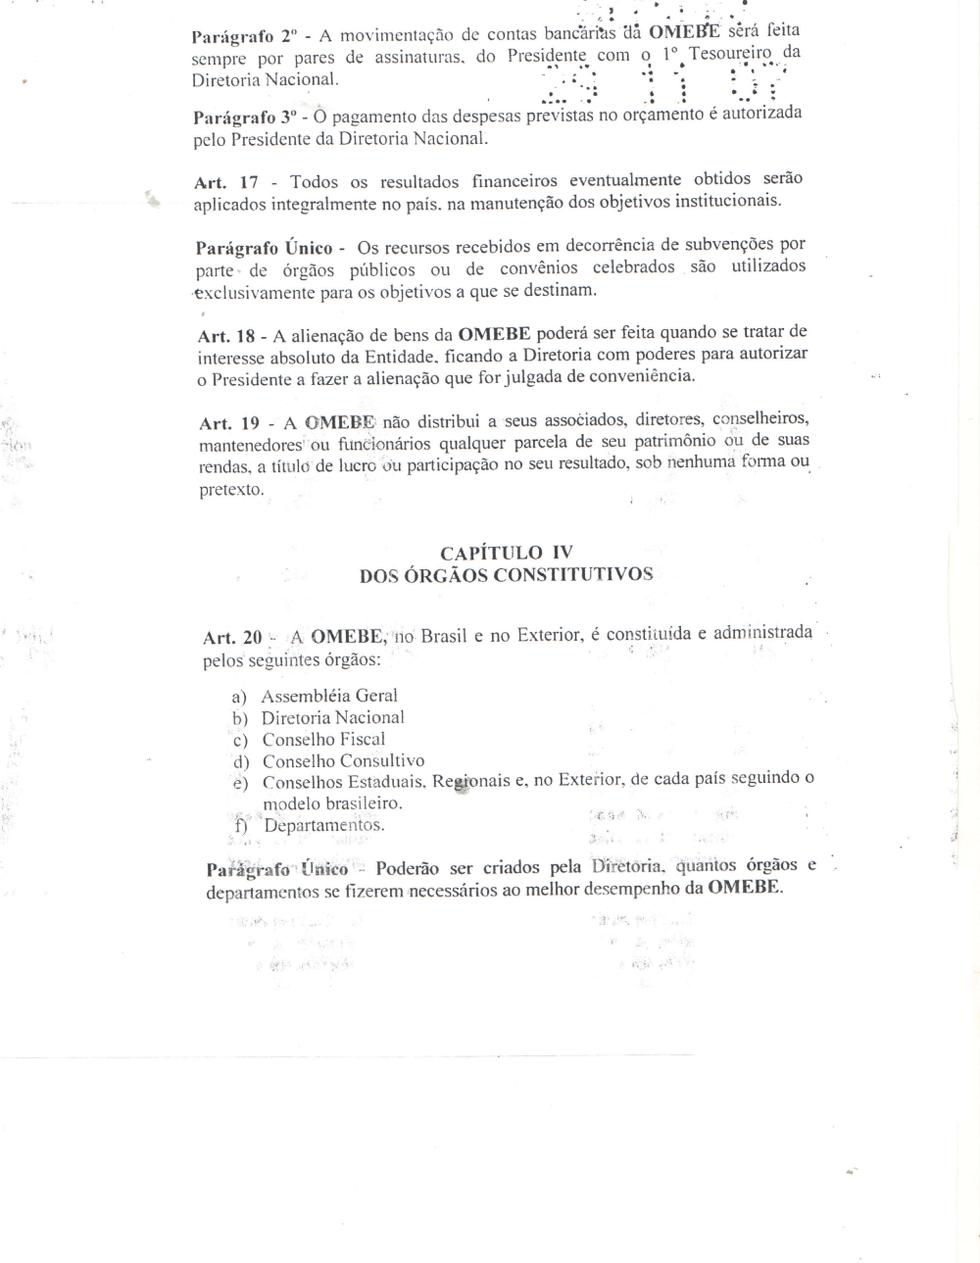 Estatuto-pag-5.png